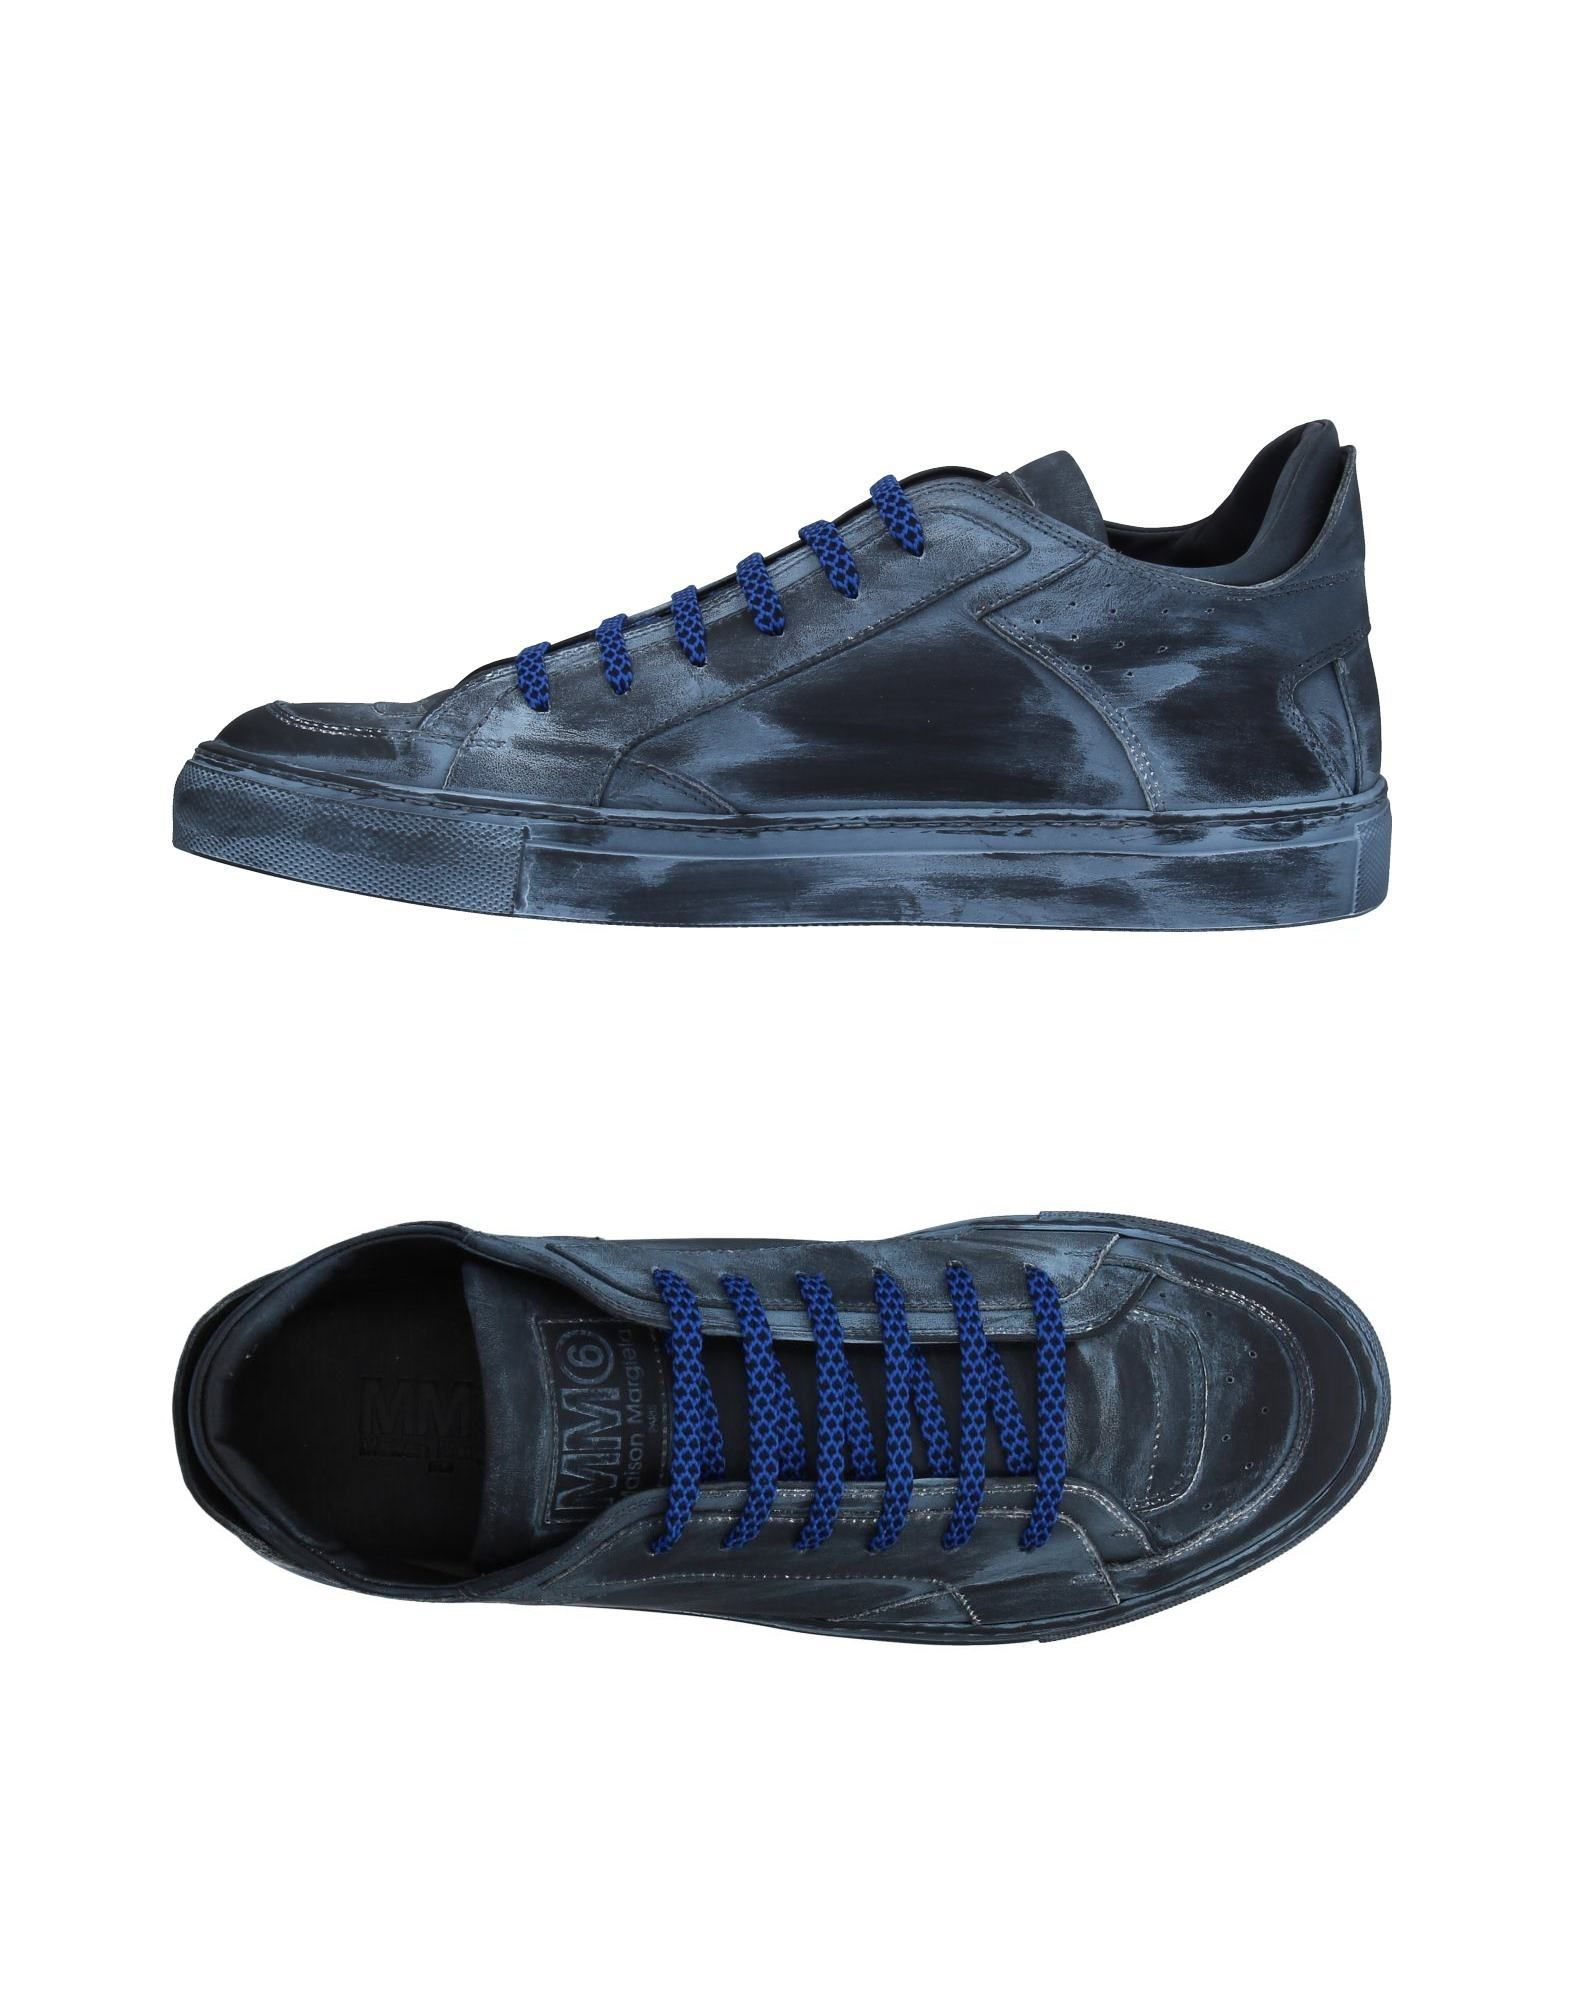 Mm6 Maison Margiela Sneakers Herren  11331177FN Gute Qualität beliebte Schuhe